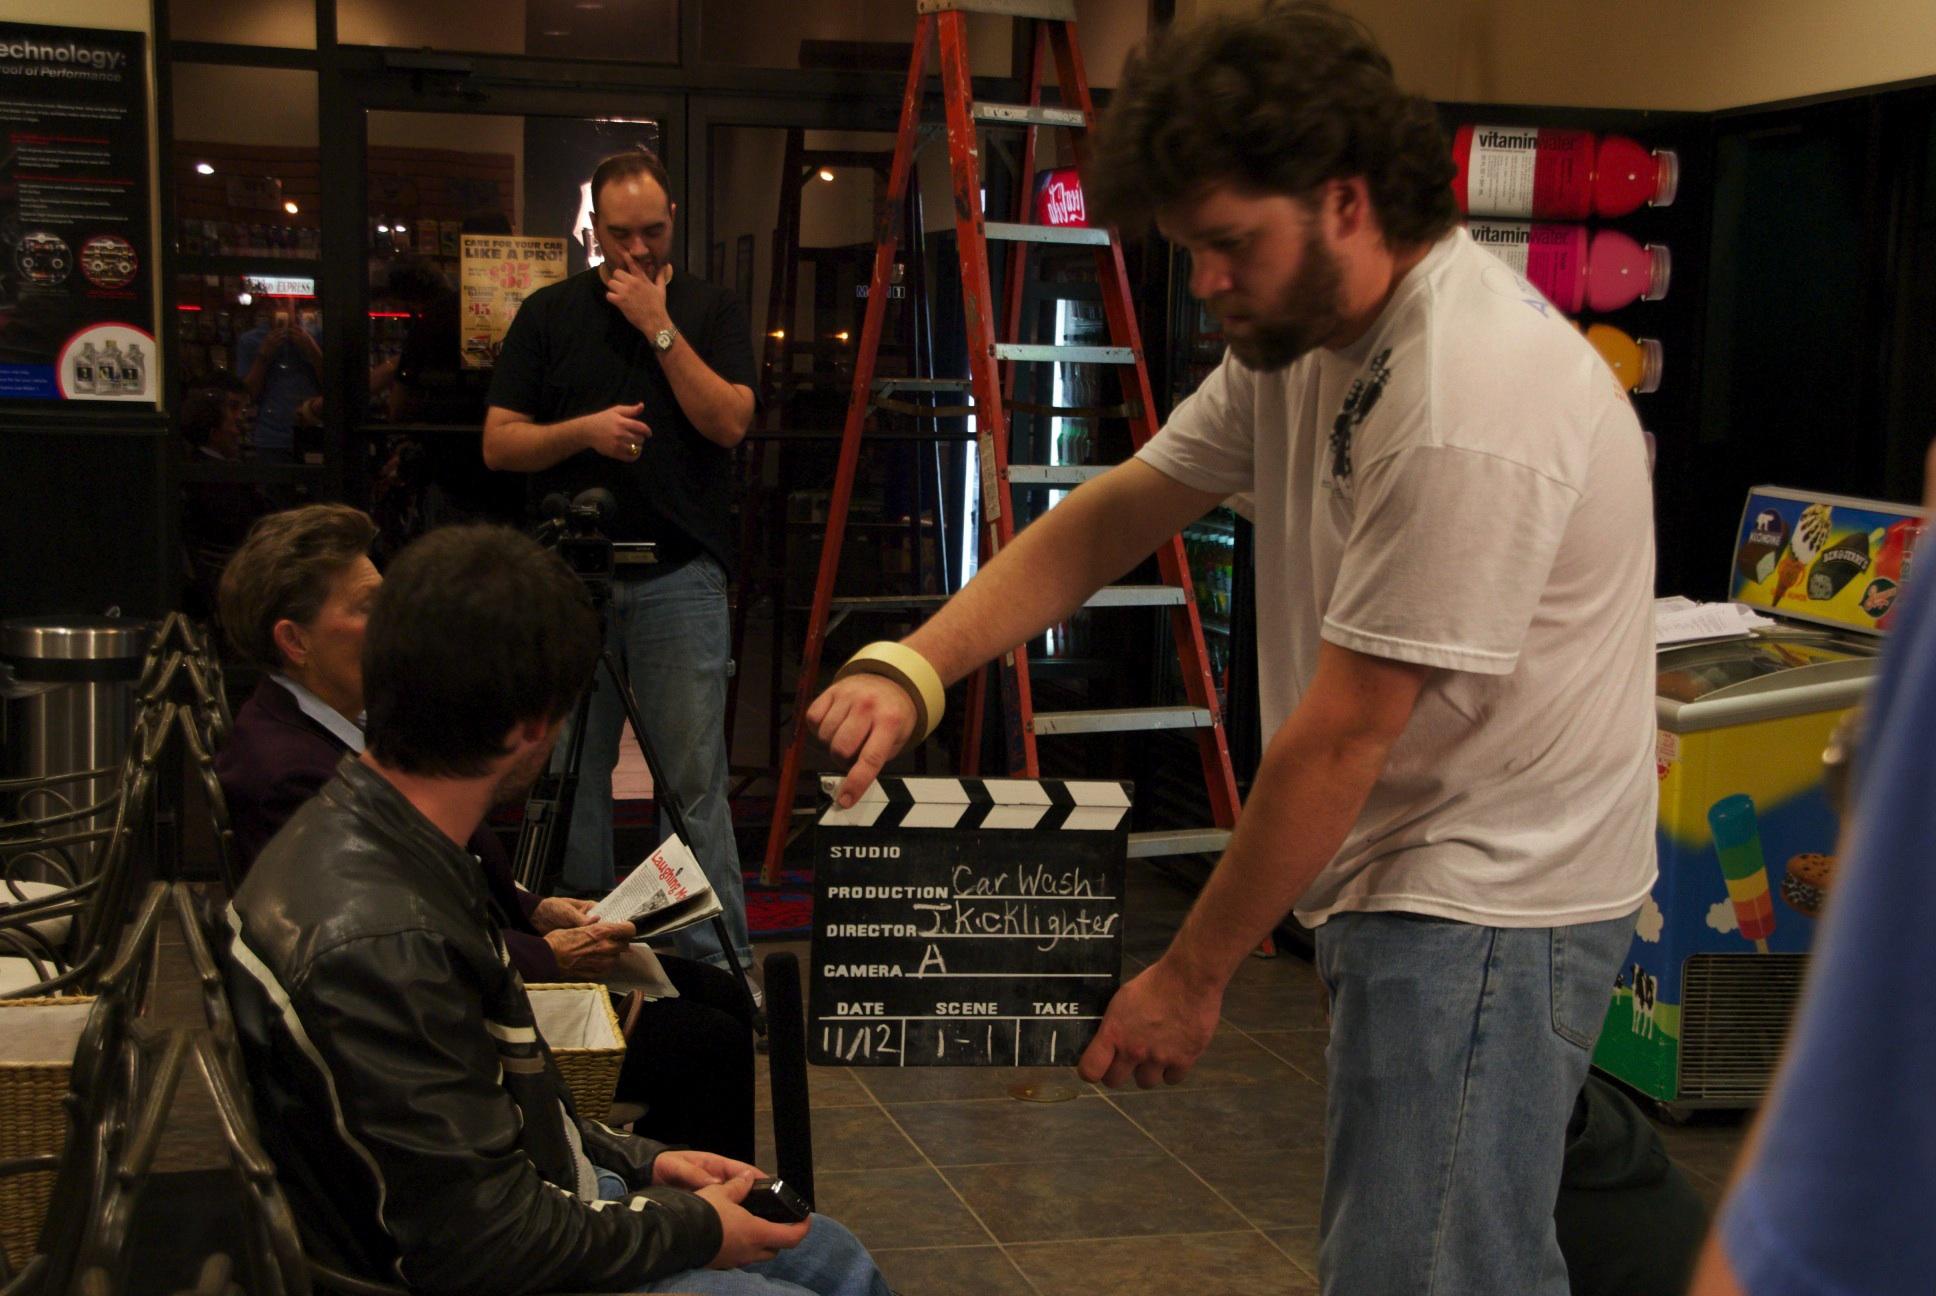 Director-James-Kicklighter-The-Car-Wash-2010